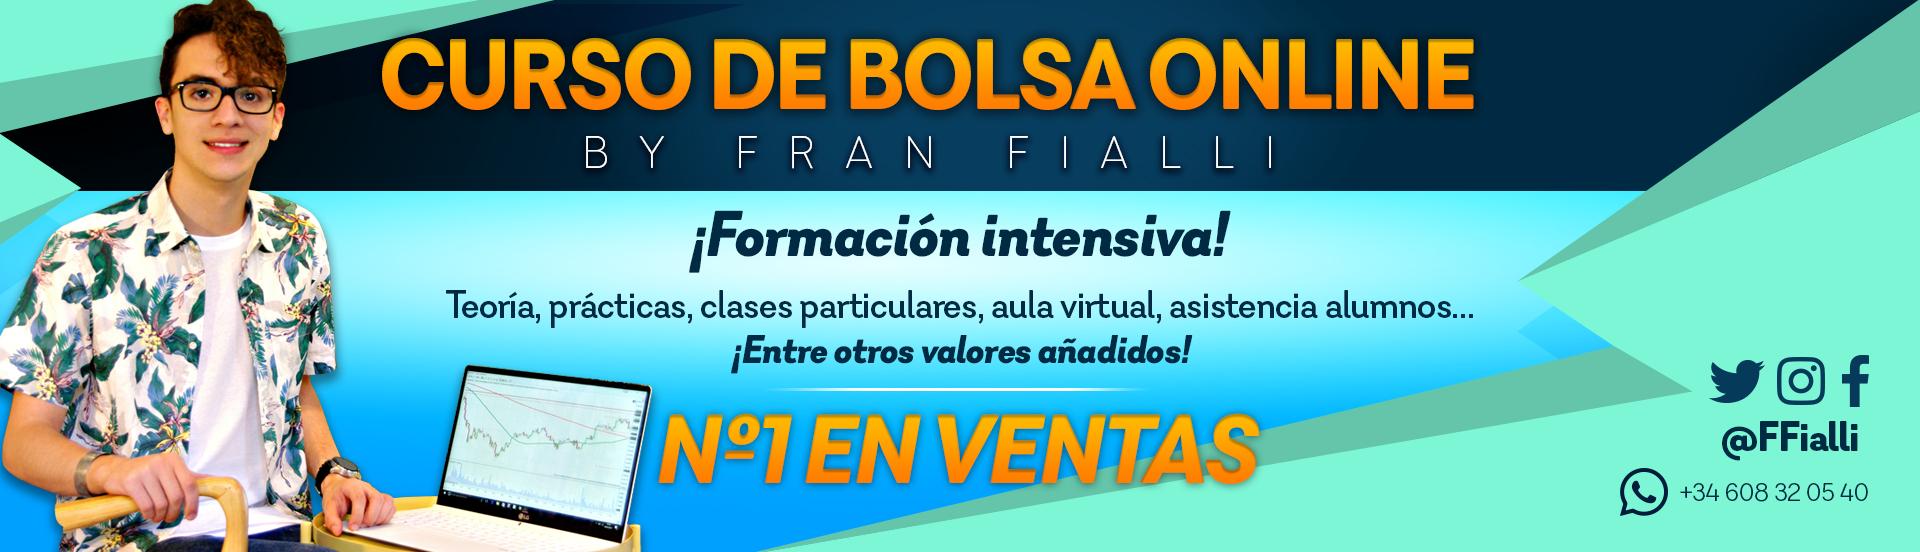 Cursos de bolsa online por Fran Fialli